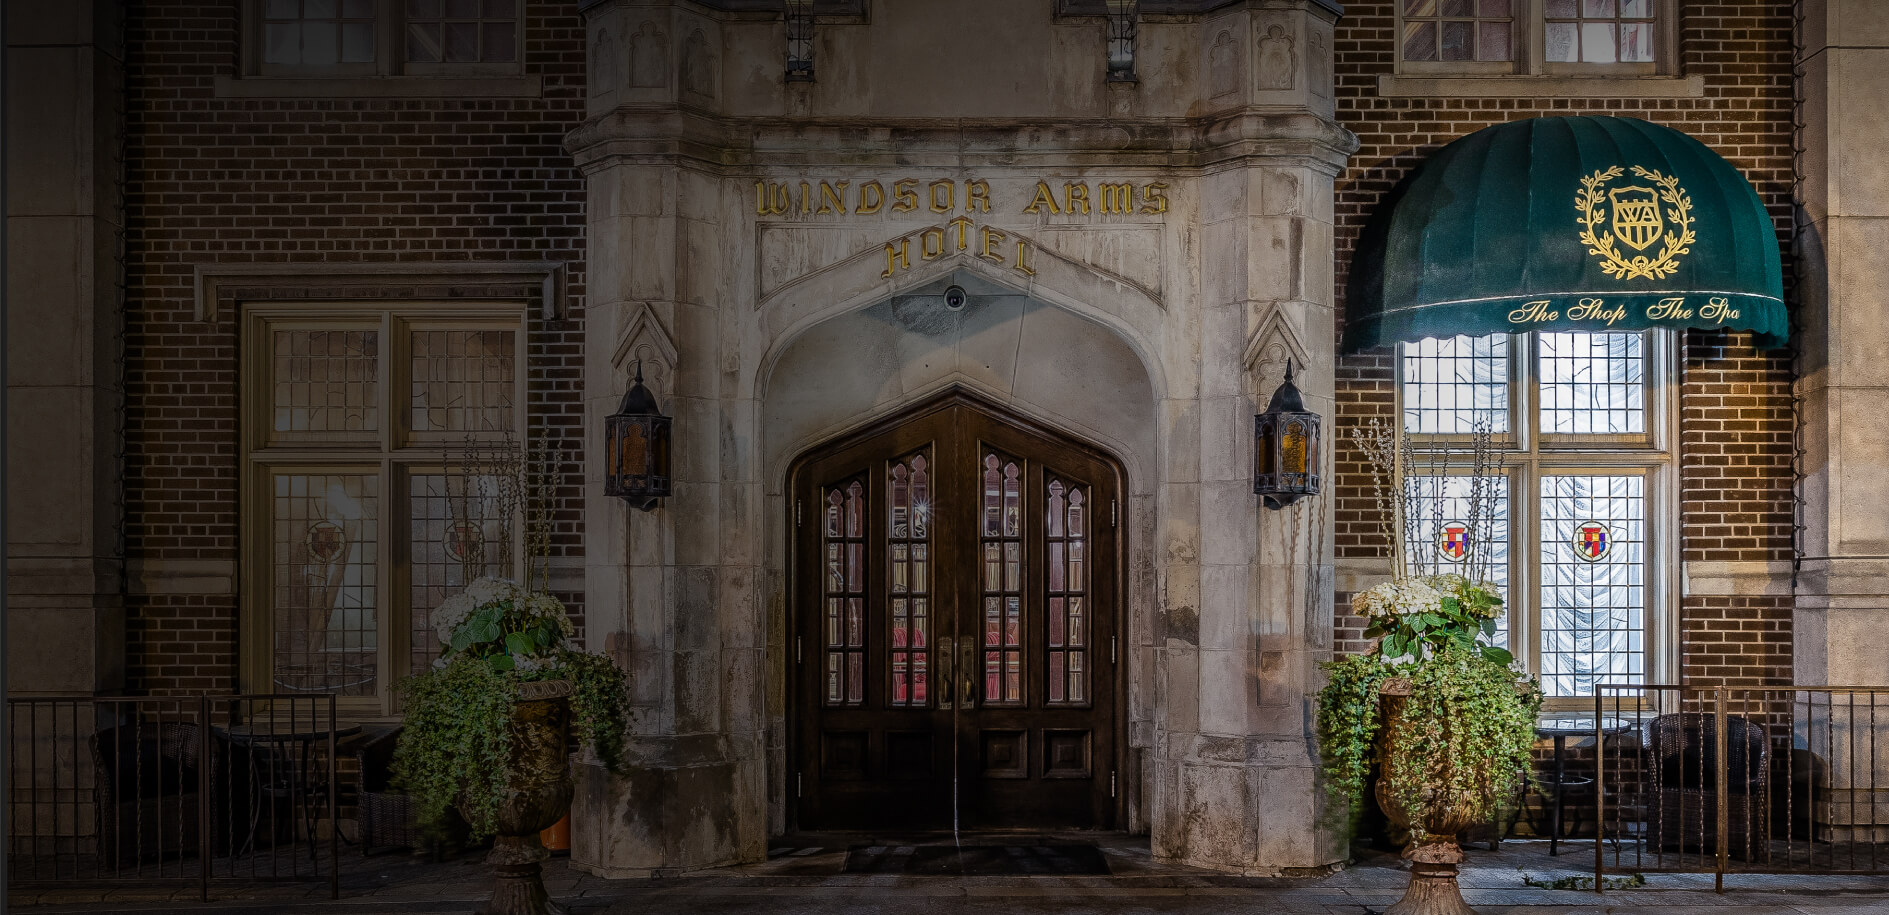 Windsor Arms Hotel Toronto